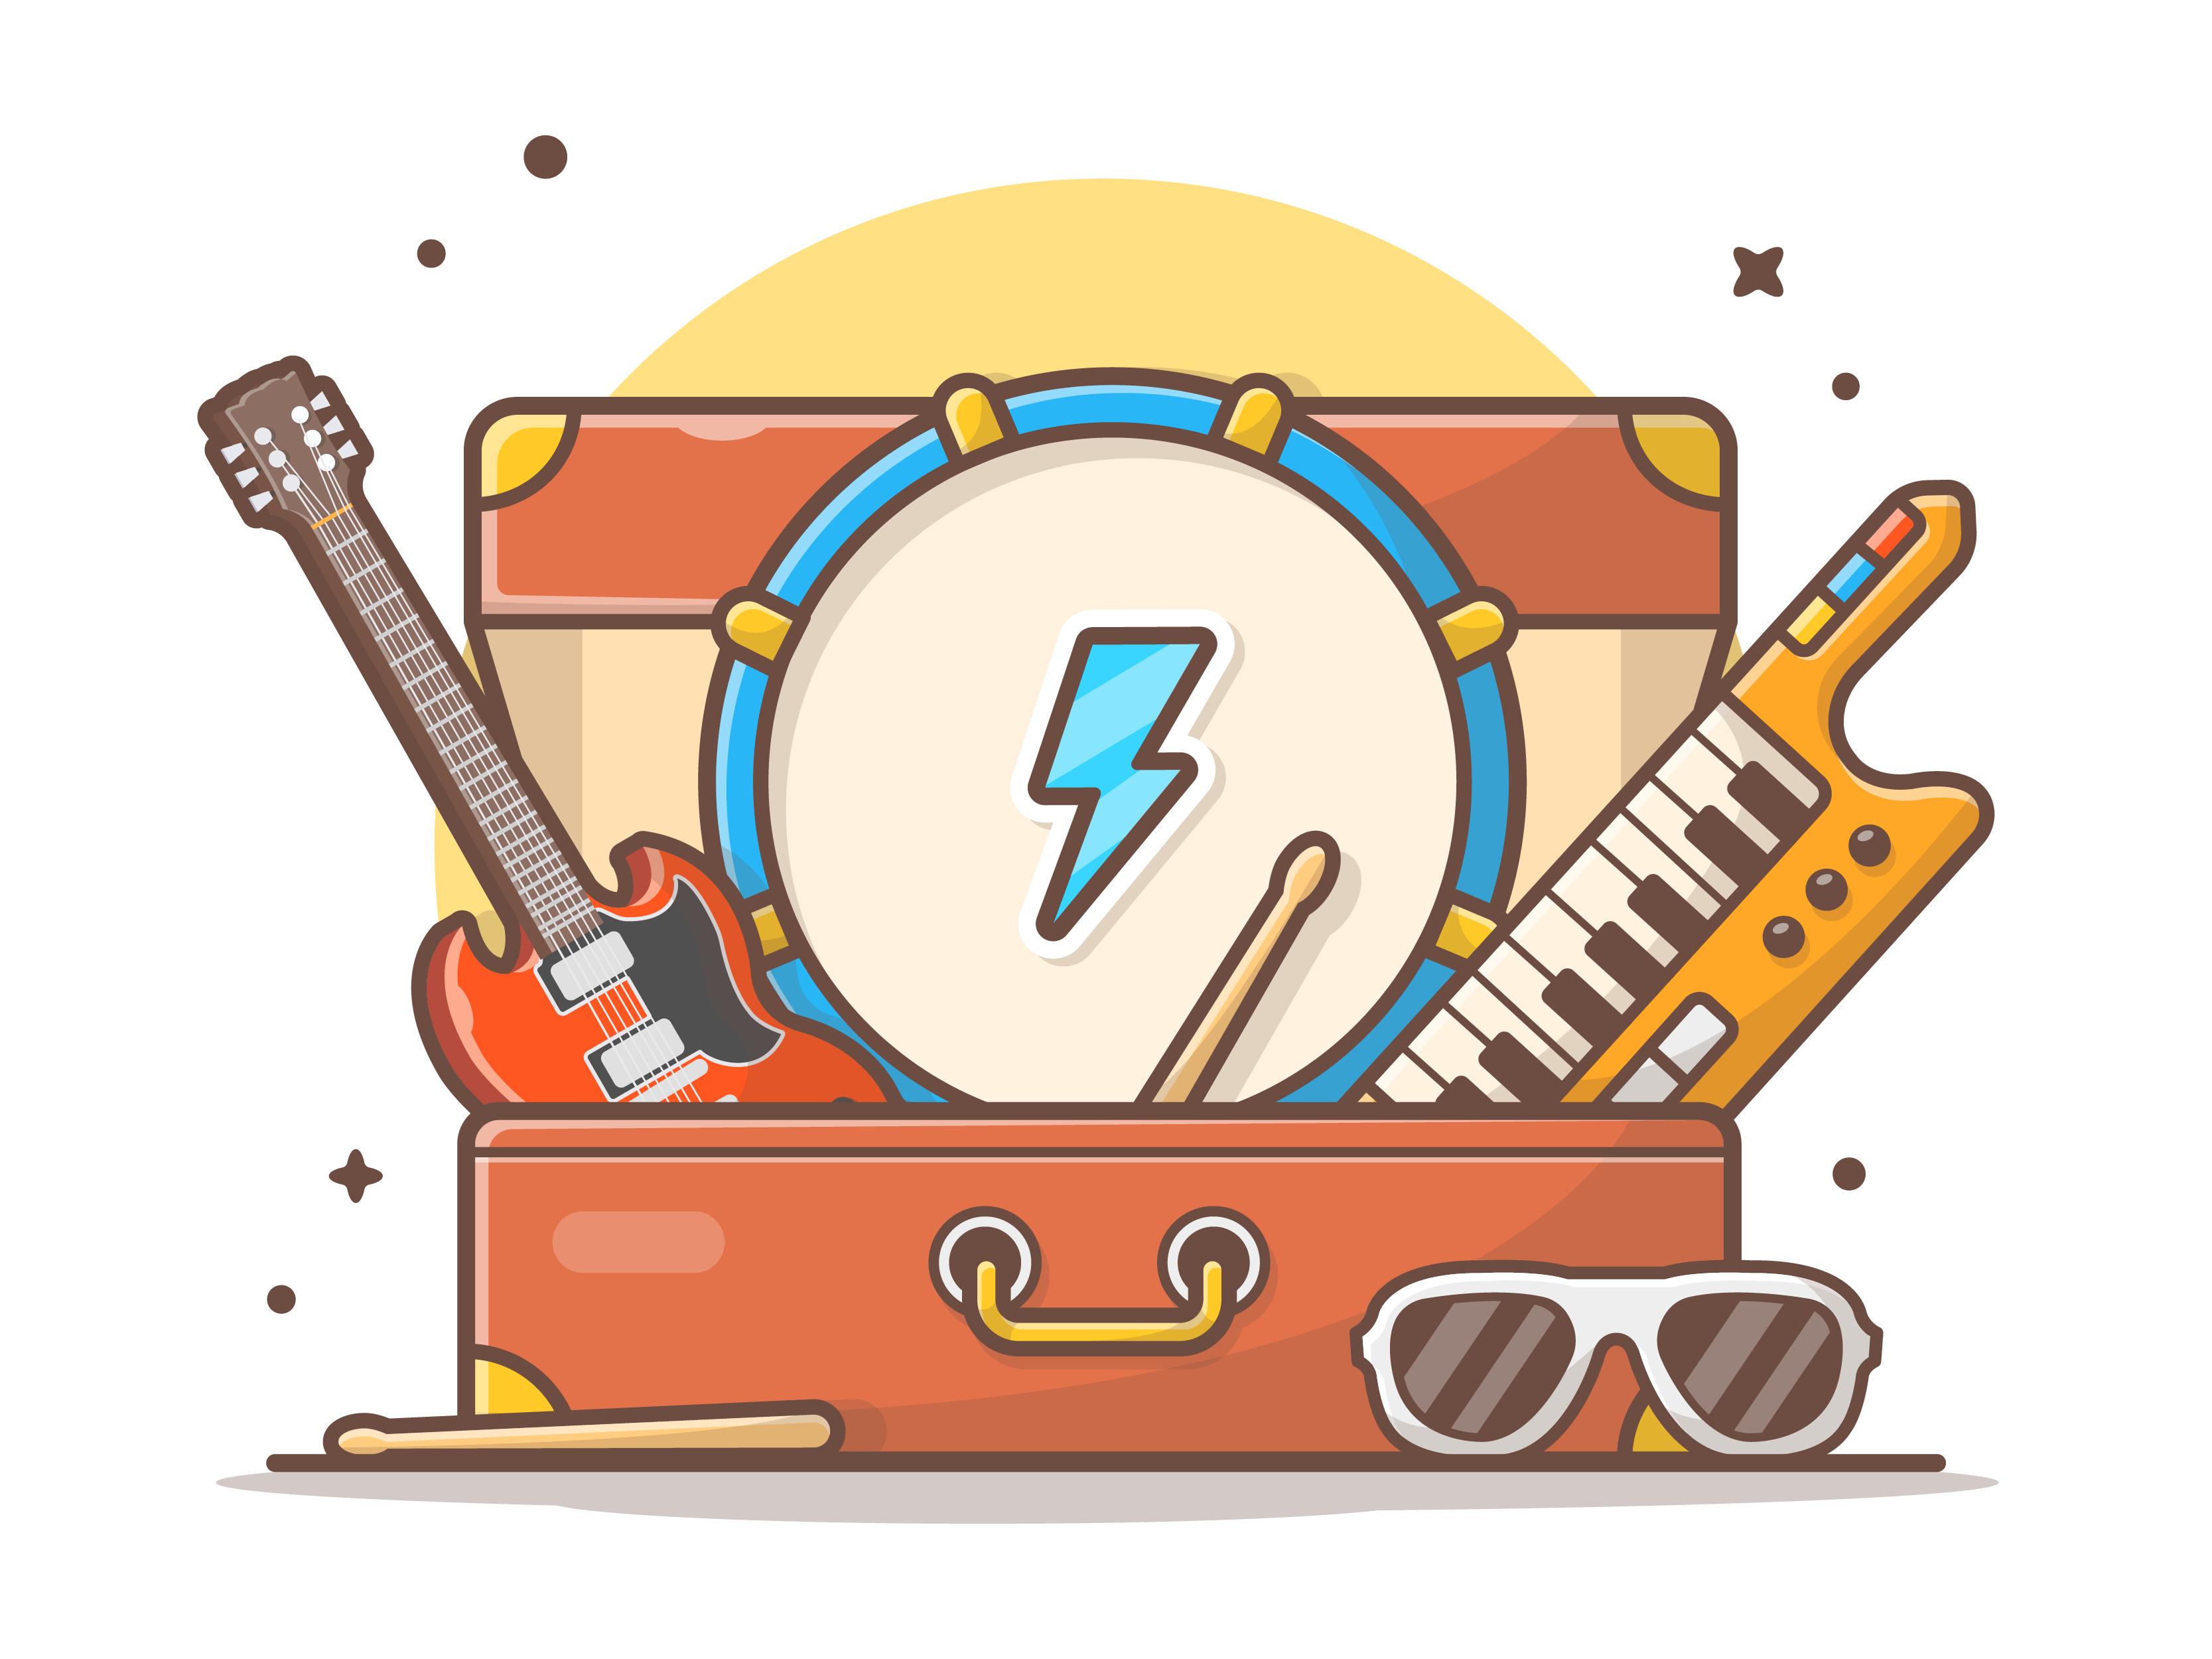 Music instrument dribbble 01